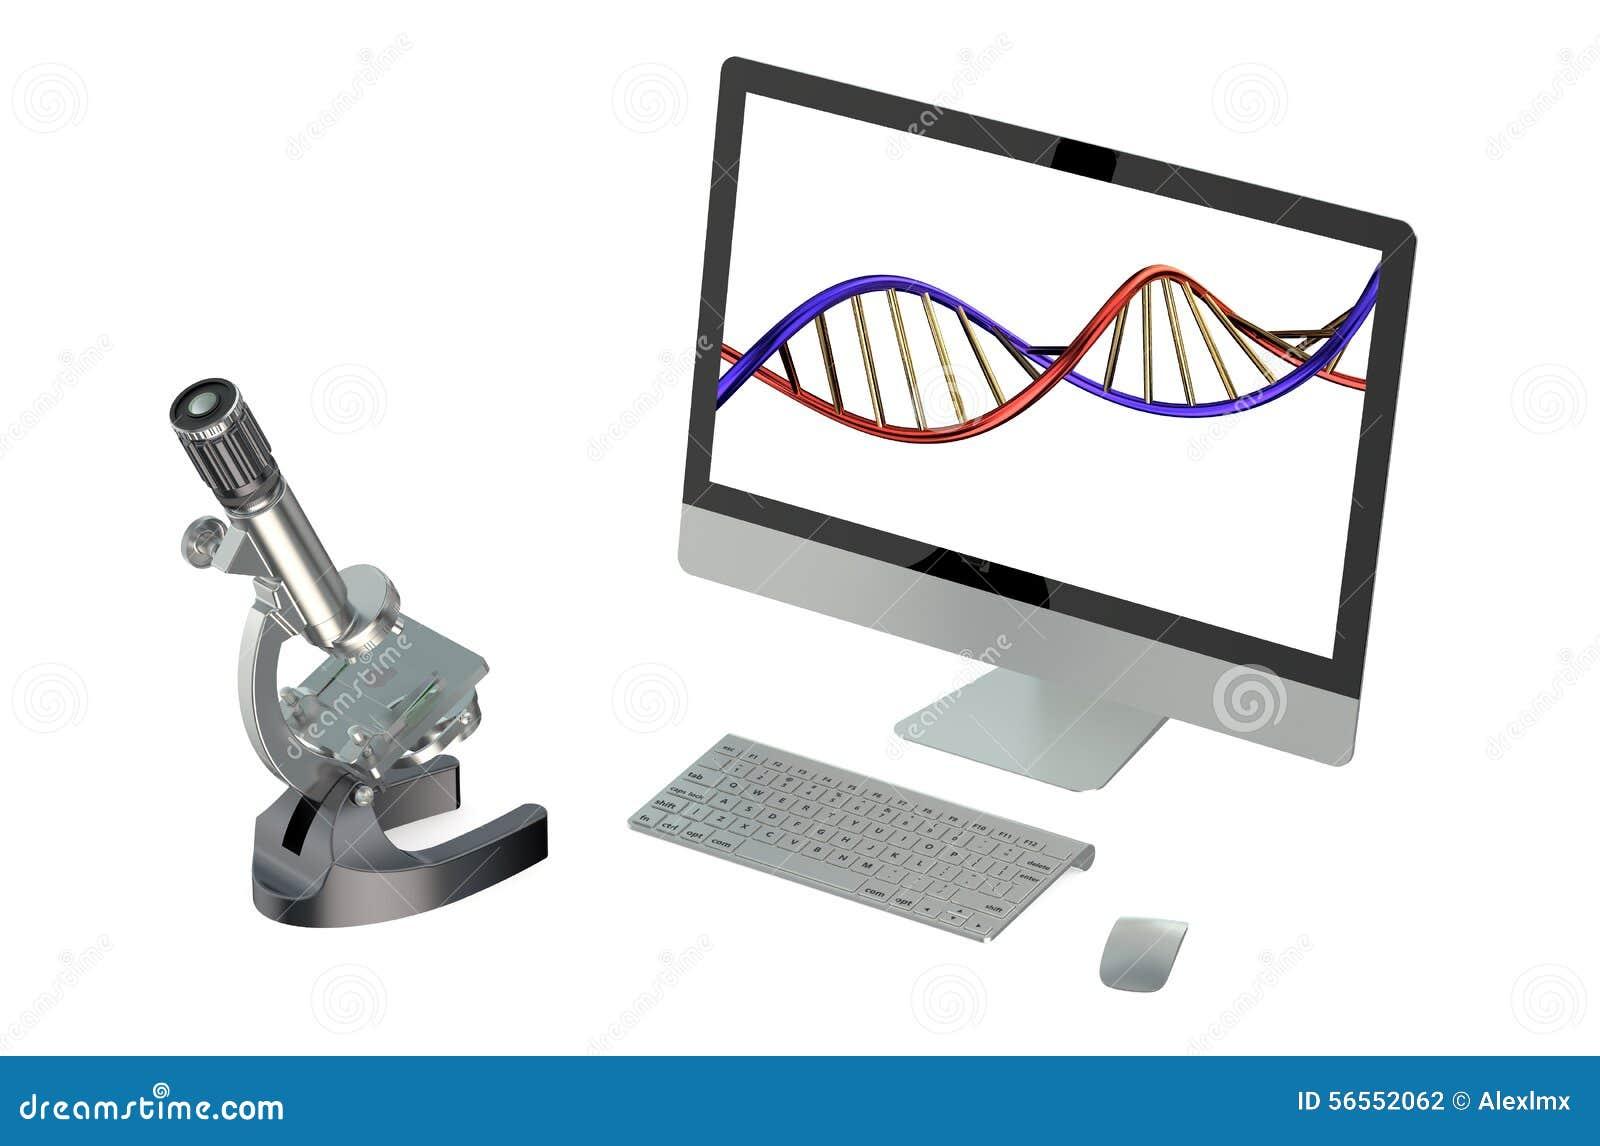 Download Μικροσκόπιο και υπολογιστής που απομονώνονται στο άσπρο υπόβαθρο Απεικόνιση αποθεμάτων - εικονογραφία από γονίδιο, πληκτρολόγιο: 56552062